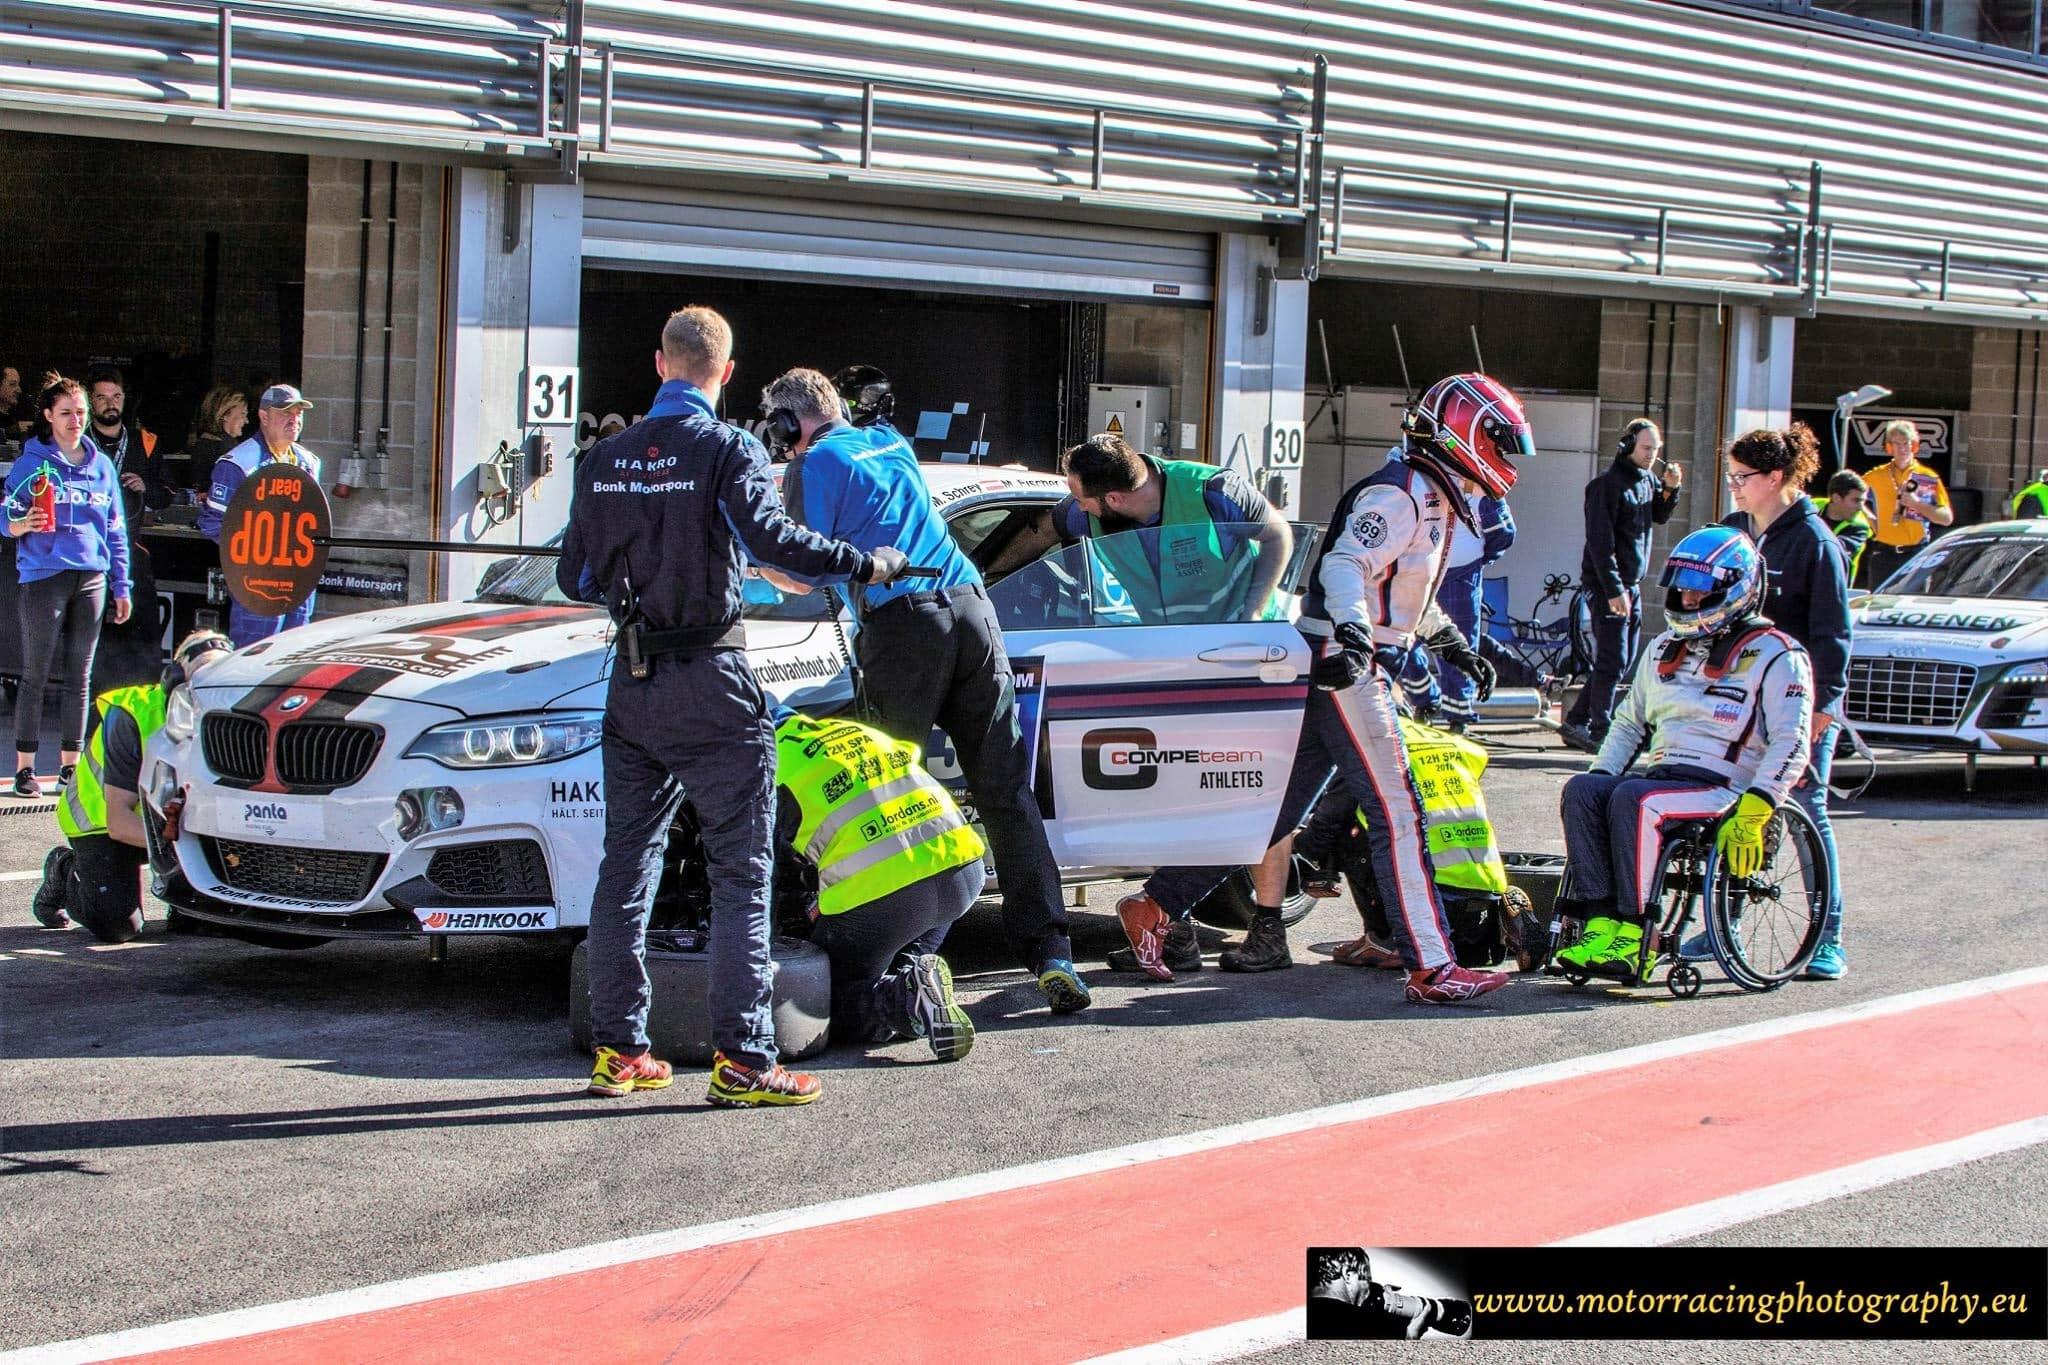 IMG 0997 1 - 12.-14. Oktober 2018 – 12h Spa-Francorchamps – Spa / BEL